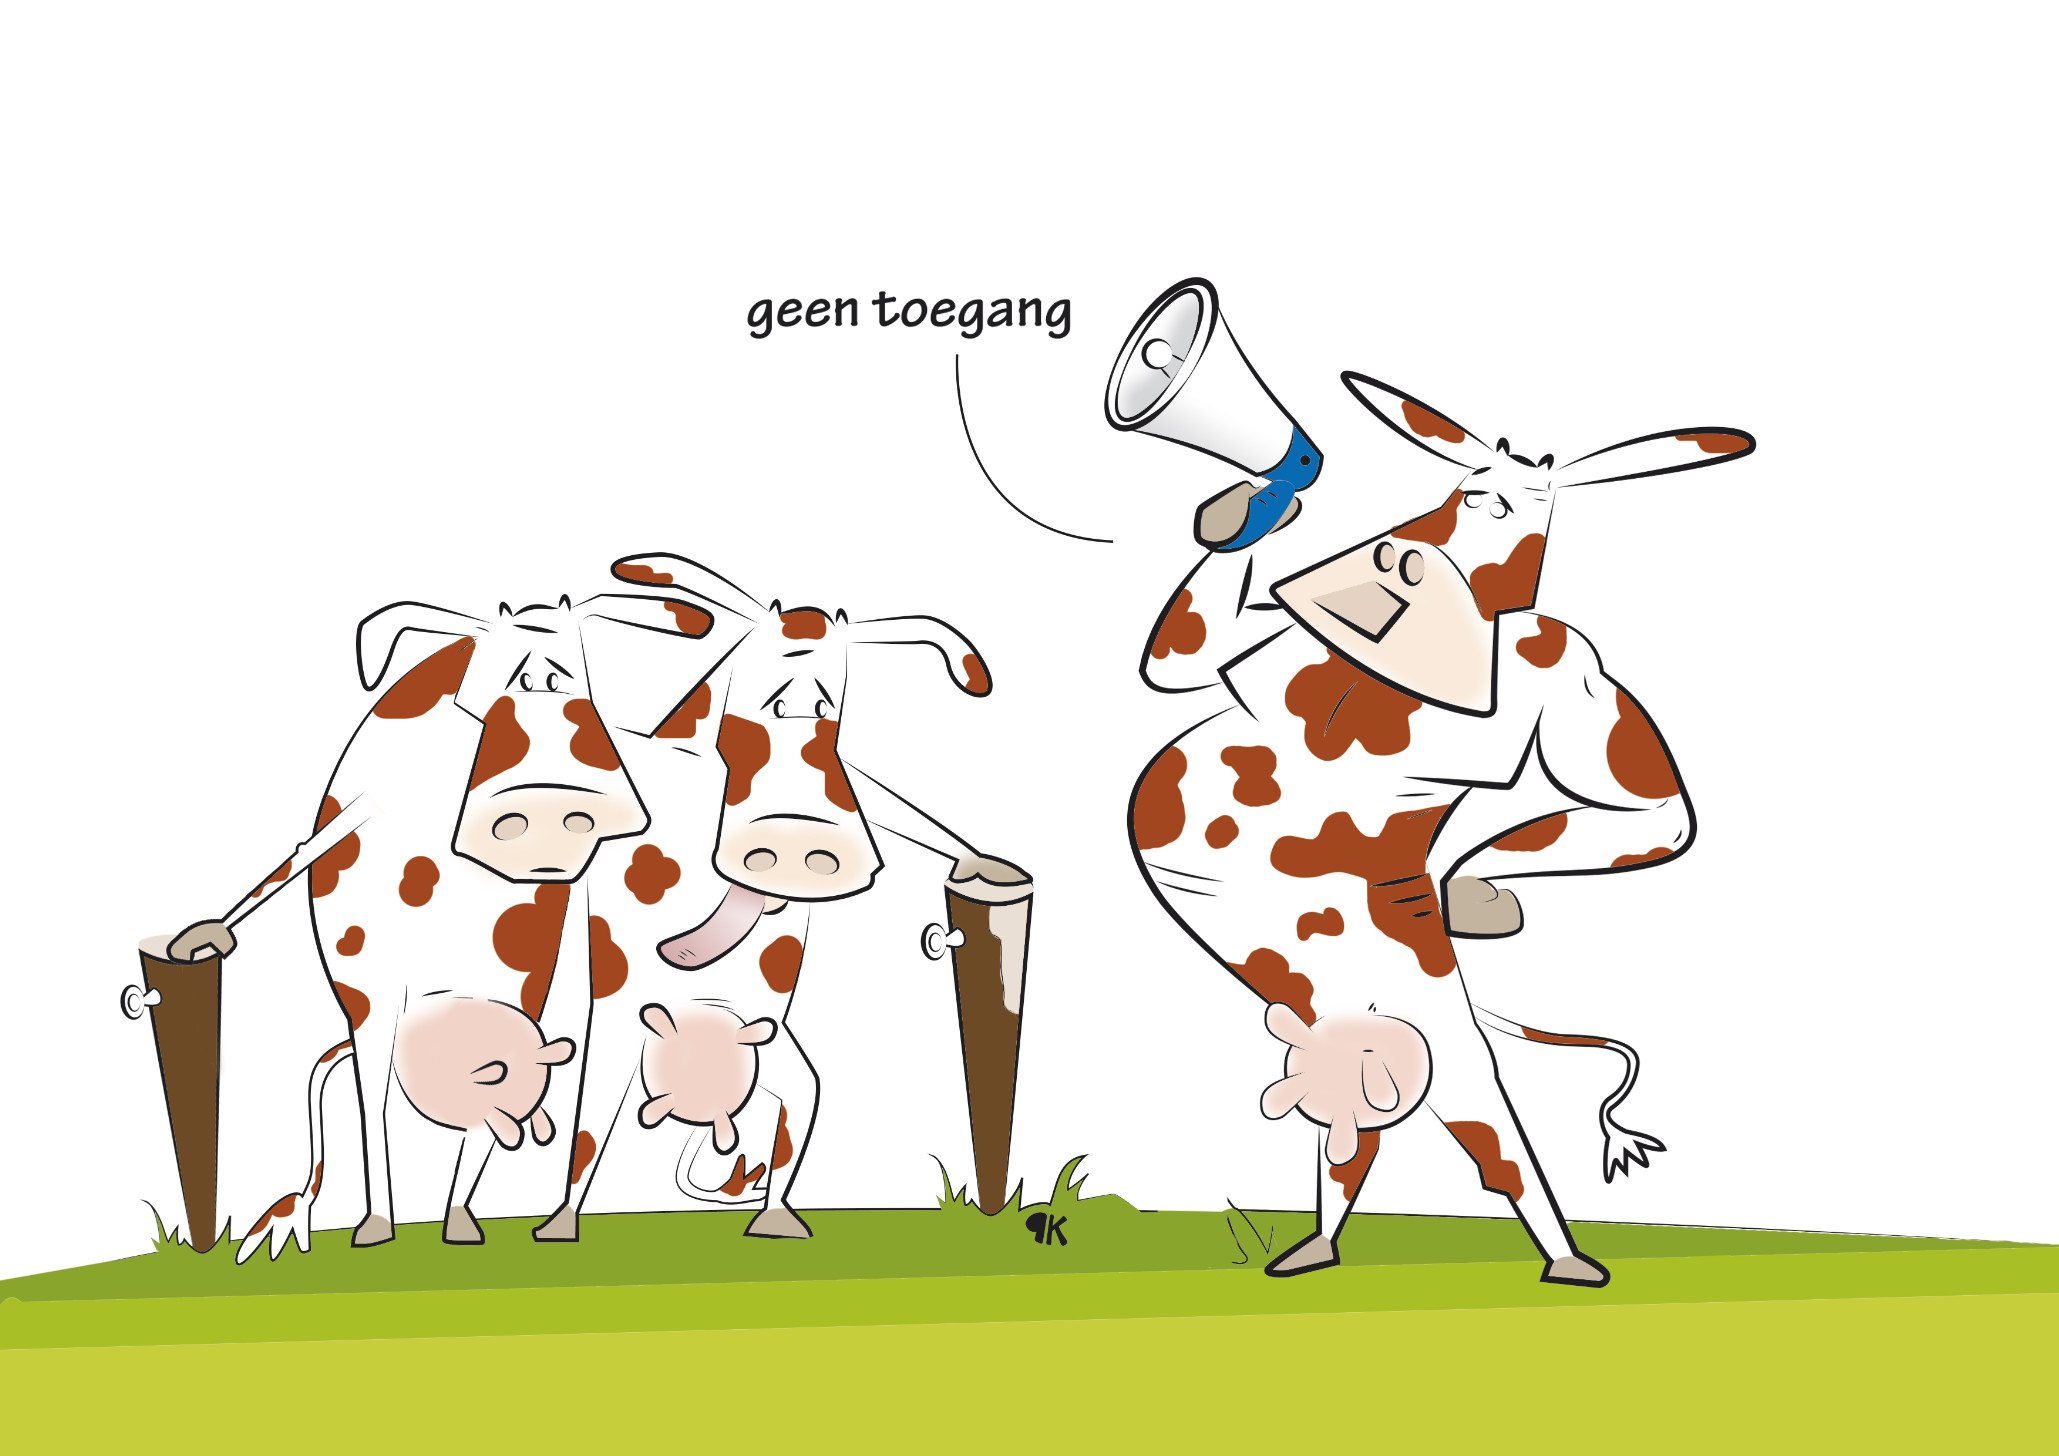 België toch akkoord met vrijhandelsverdrag CETA